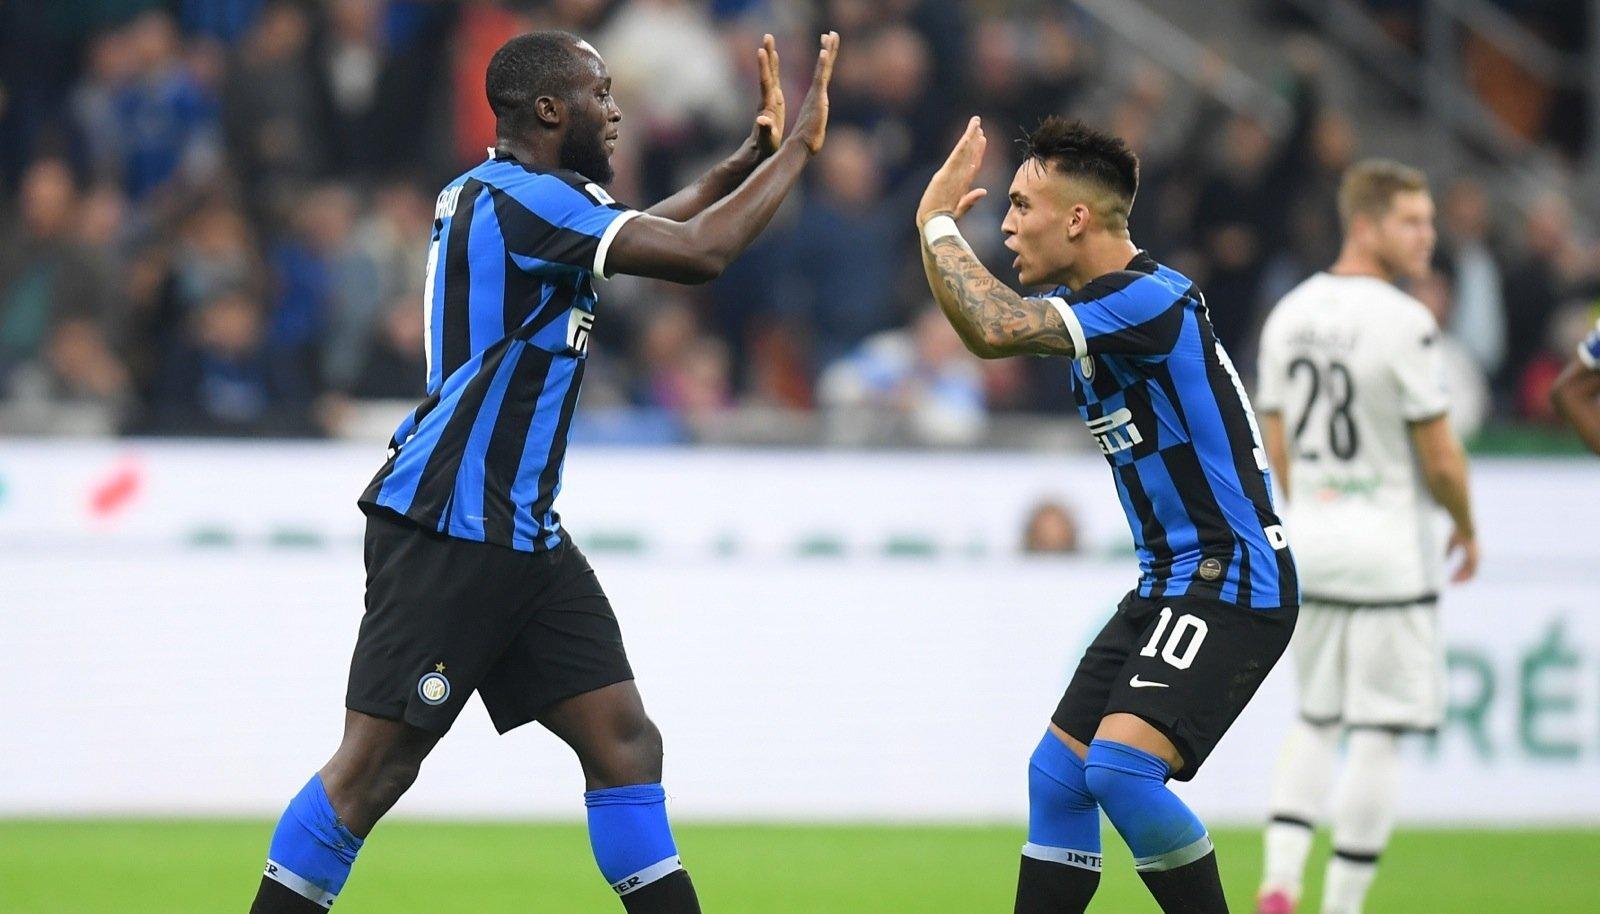 (SP)ITALY-MILAN-SOCCER-SERIE A-INTER VS PARMA